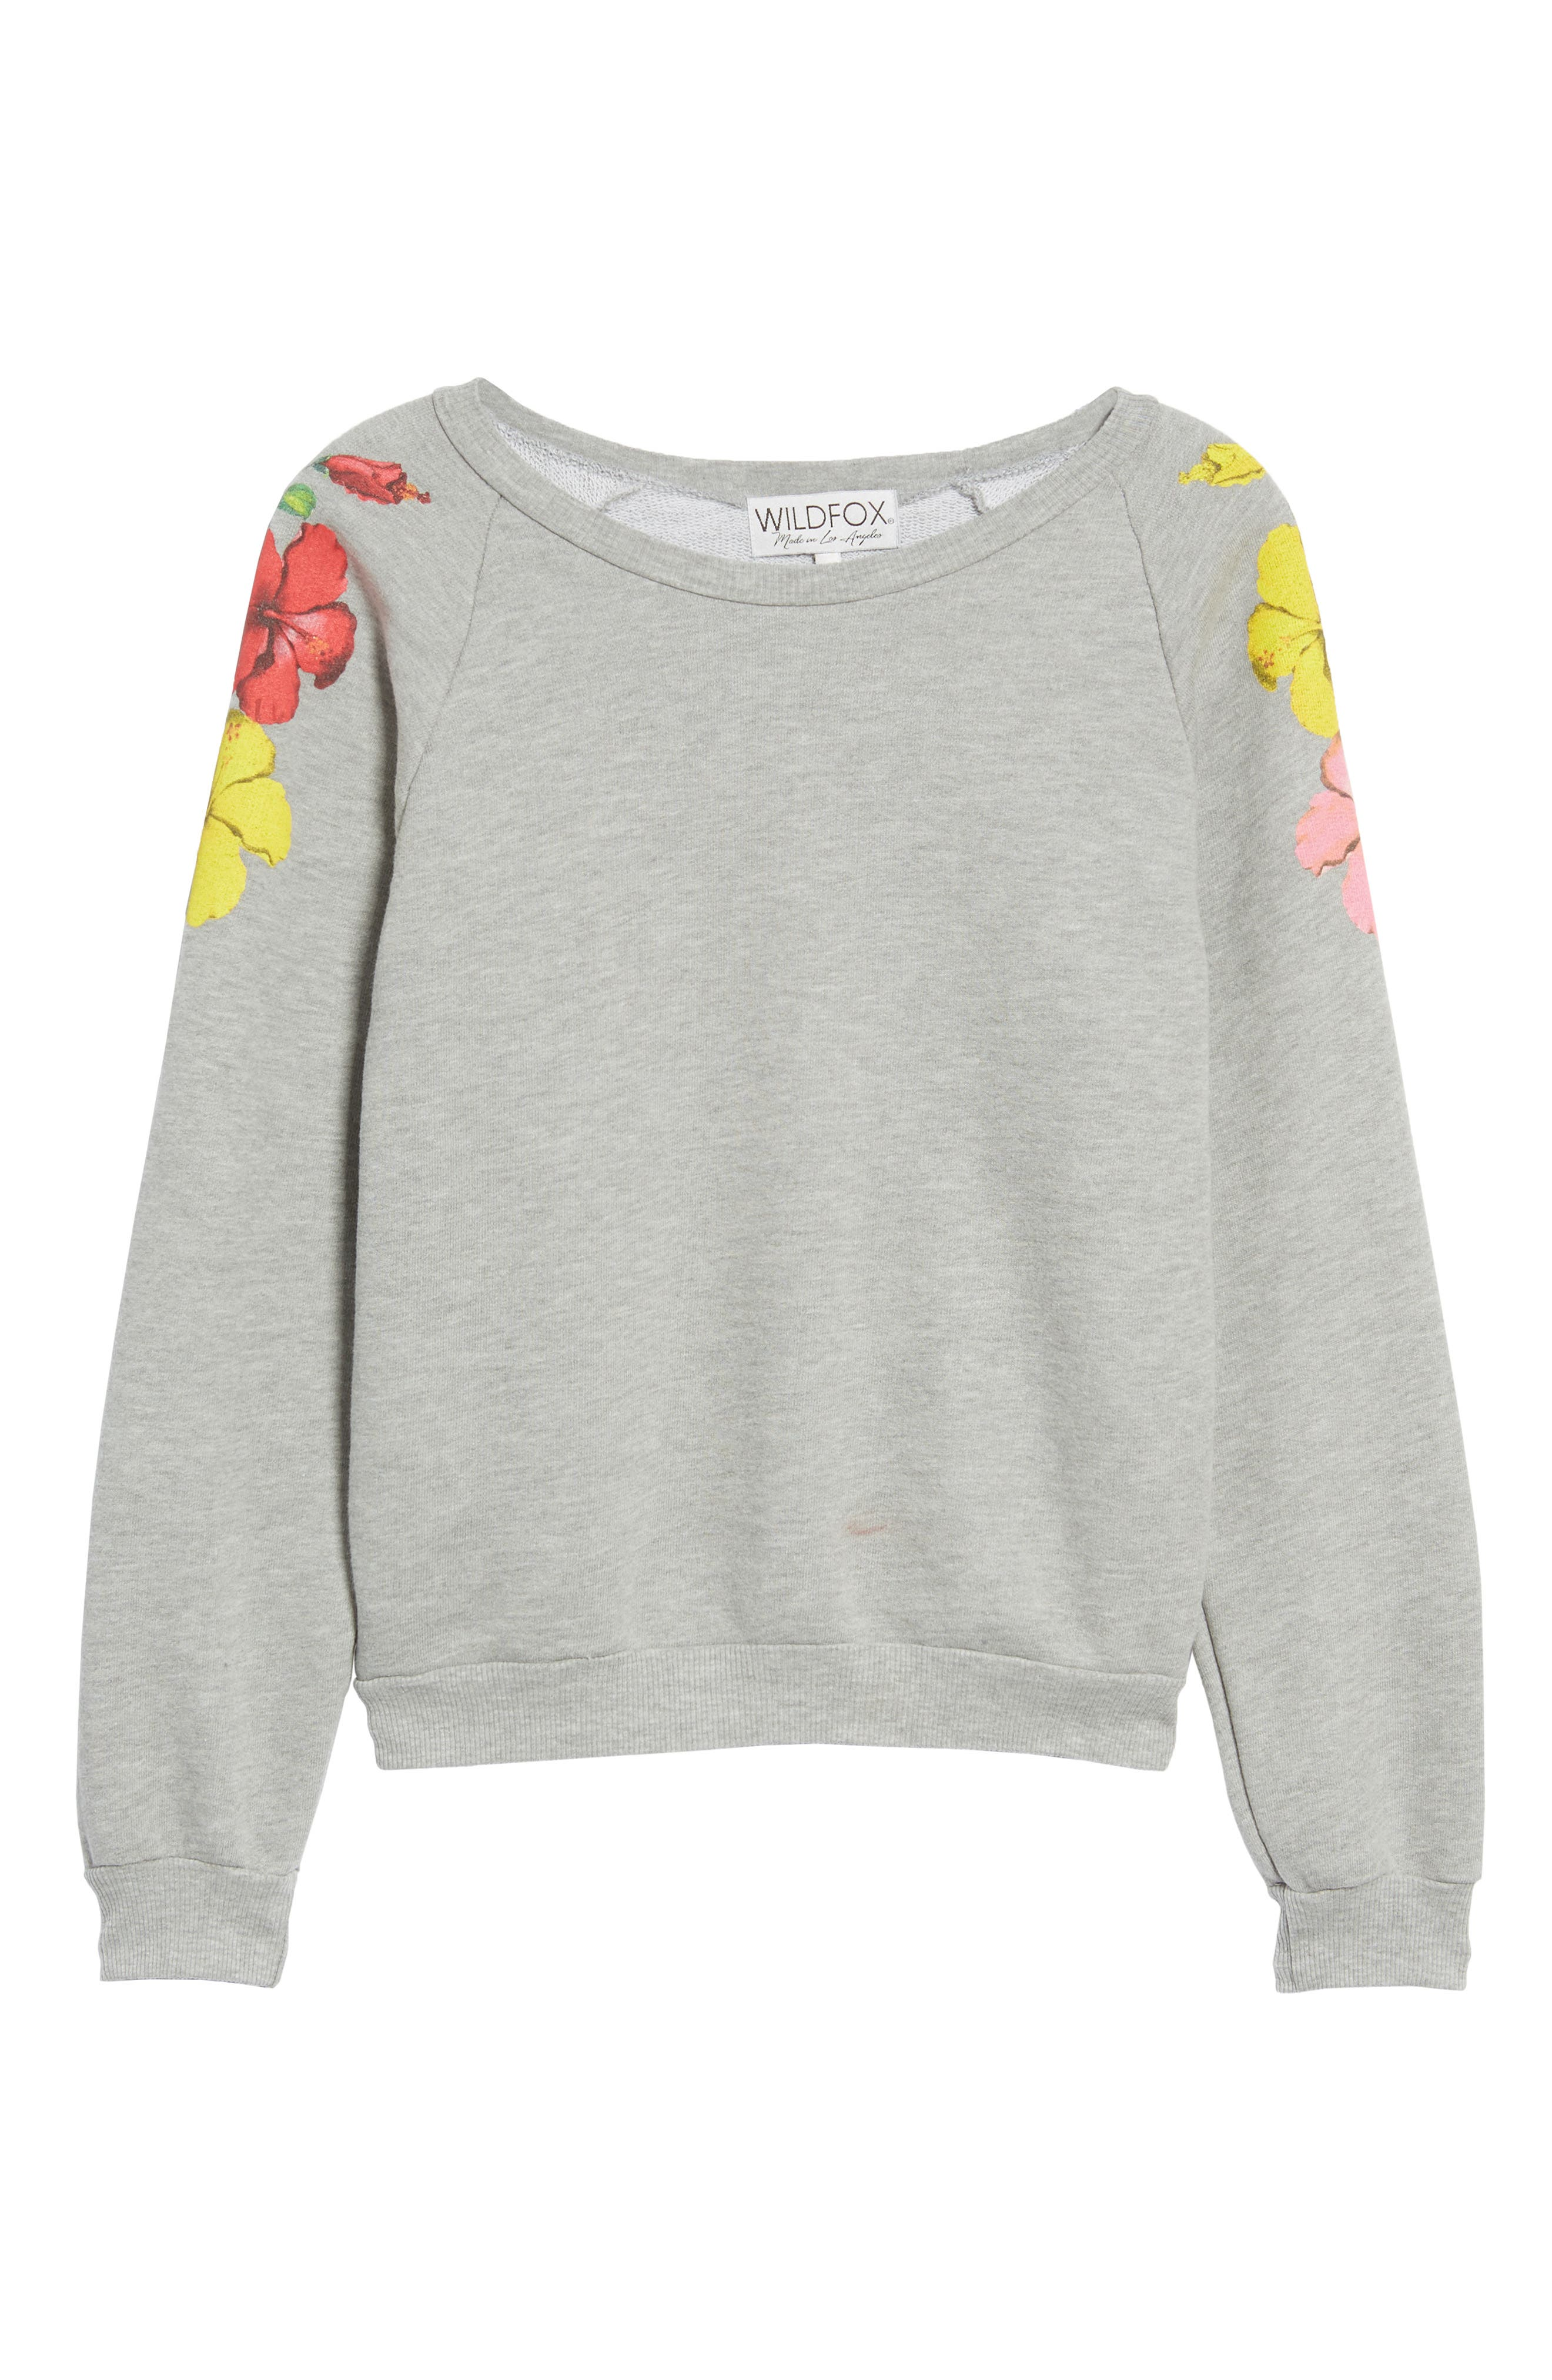 Hibiscus Junior Sweatshirt,                             Alternate thumbnail 6, color,                             020